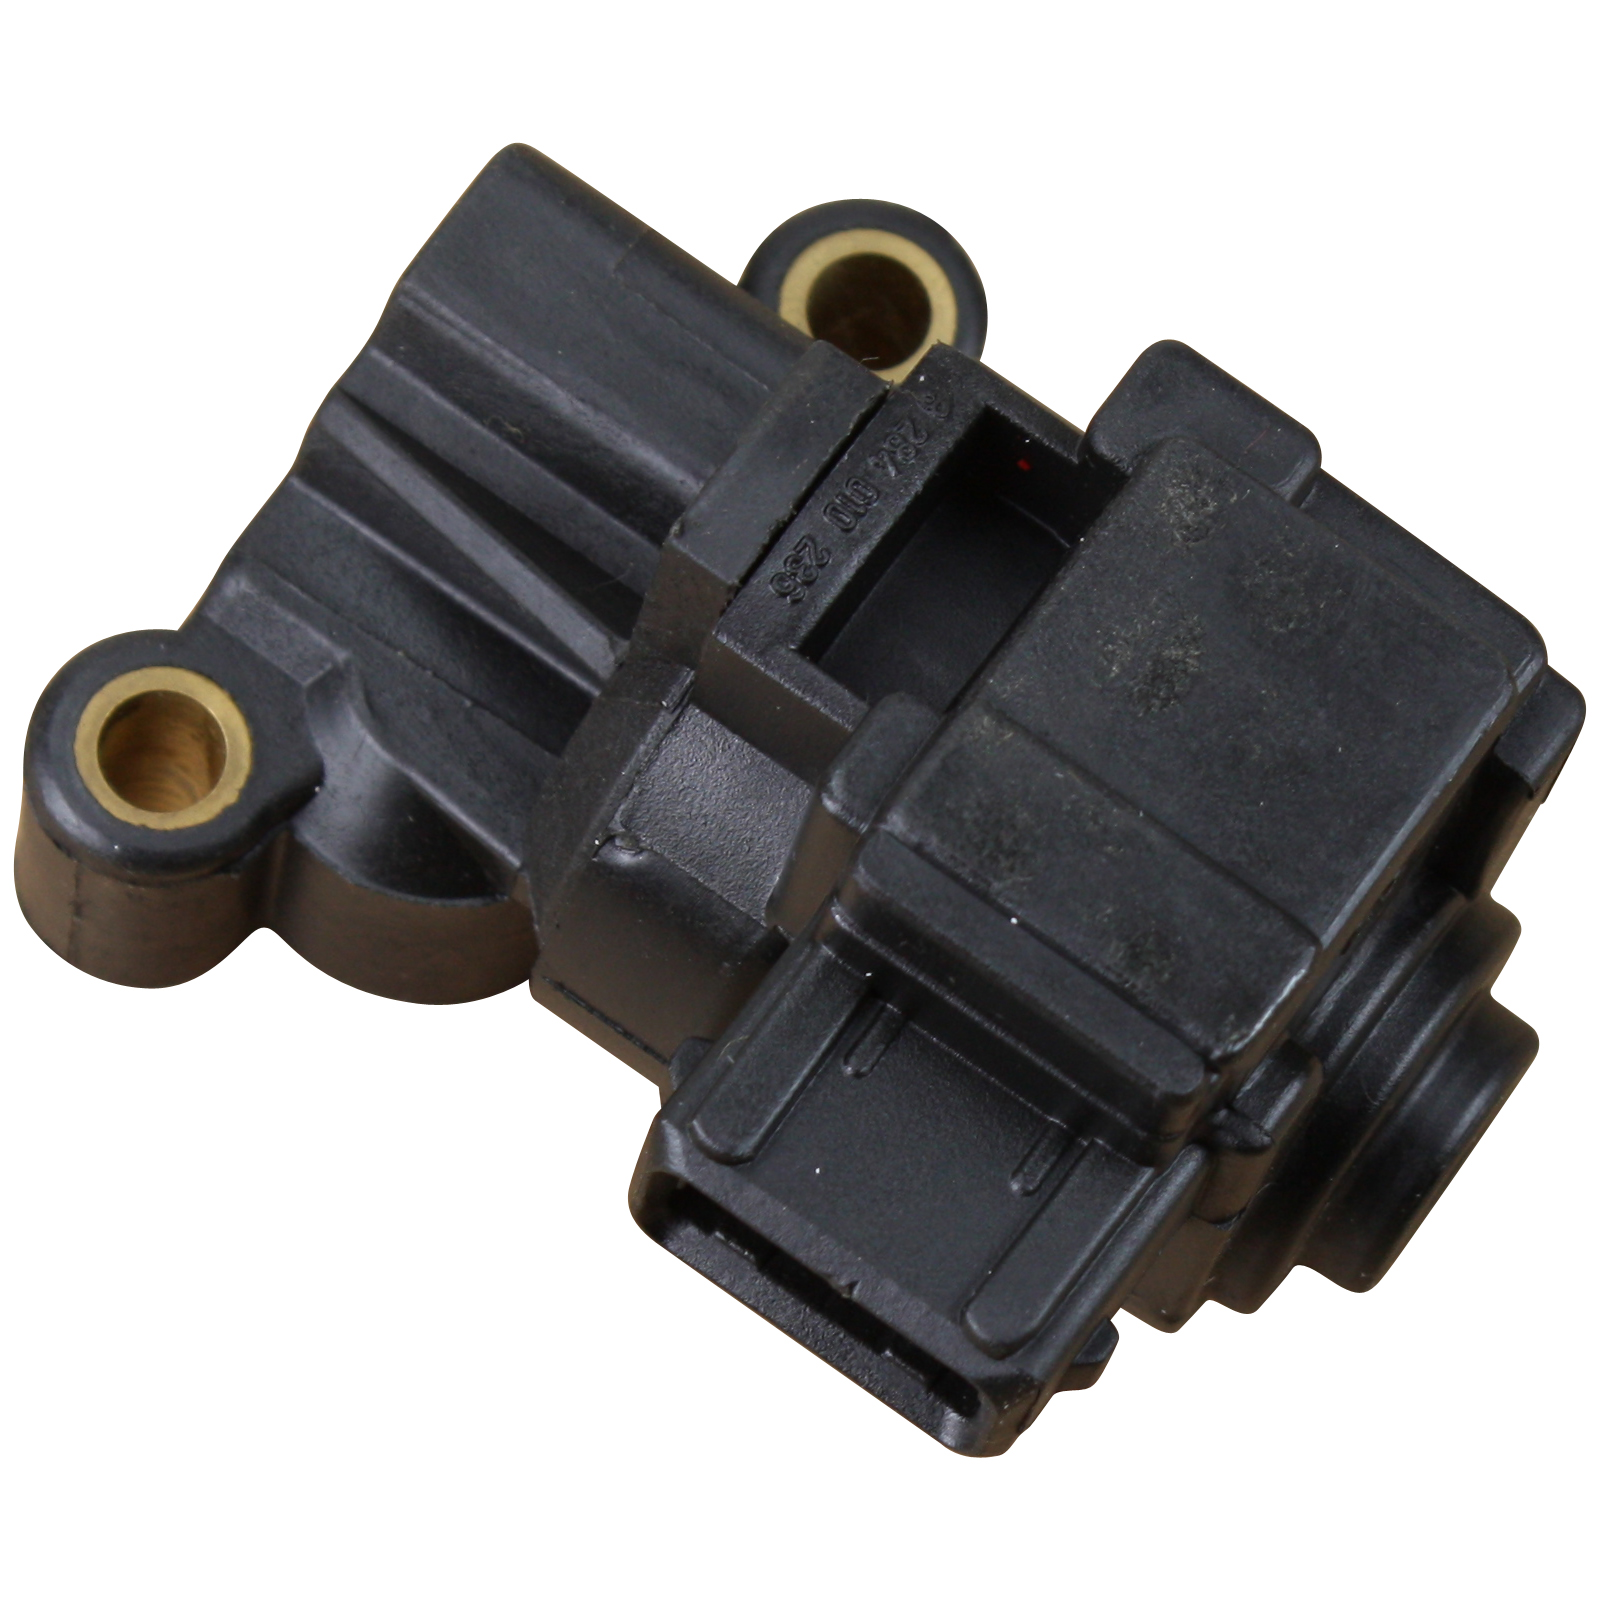 hight resolution of brand new idle air control valve bmw e36 318 z3 iac motor oem fit iac494